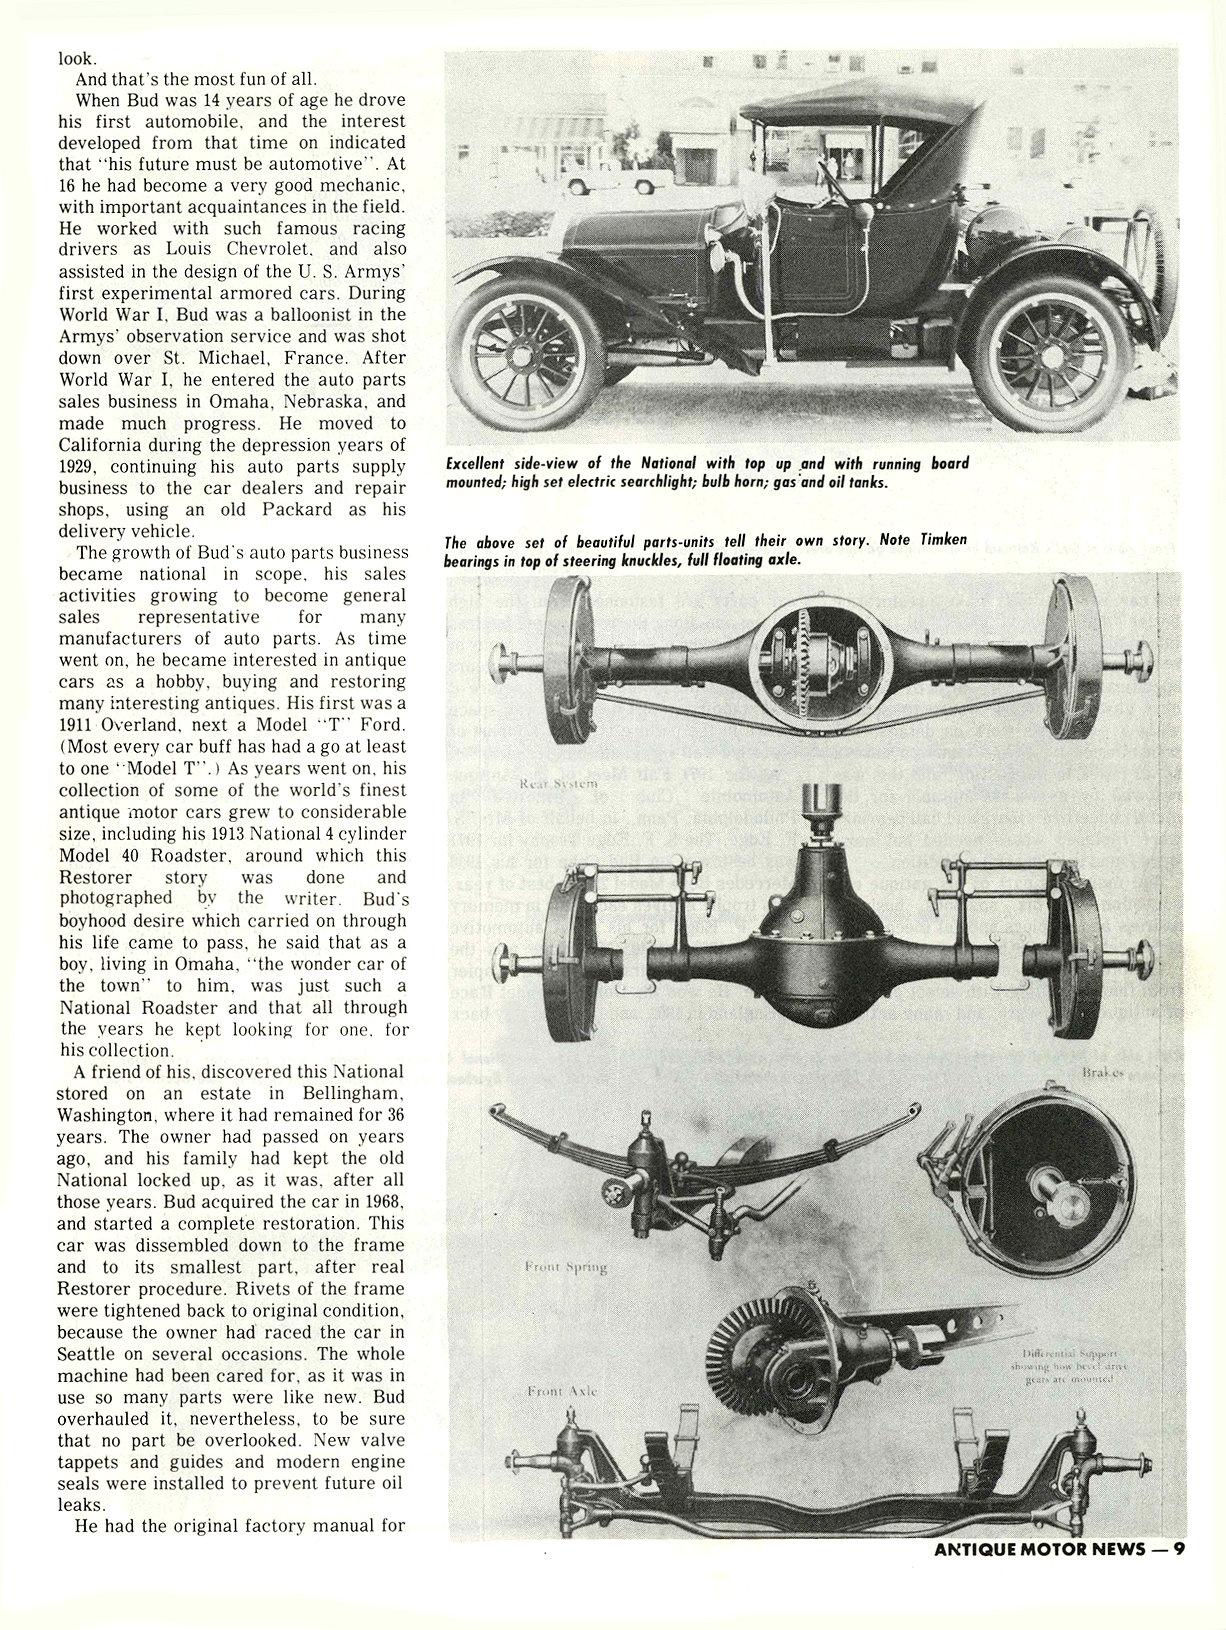 "1913 NATIONAL M. L. ""Bud"" Cohn, owner THE RESTORER Researched by Clifford Sklarek ANTIQUE MOTOR NEWS & Atlantic Auto Advertiser November 1972 8.25″x10.25 page 9"